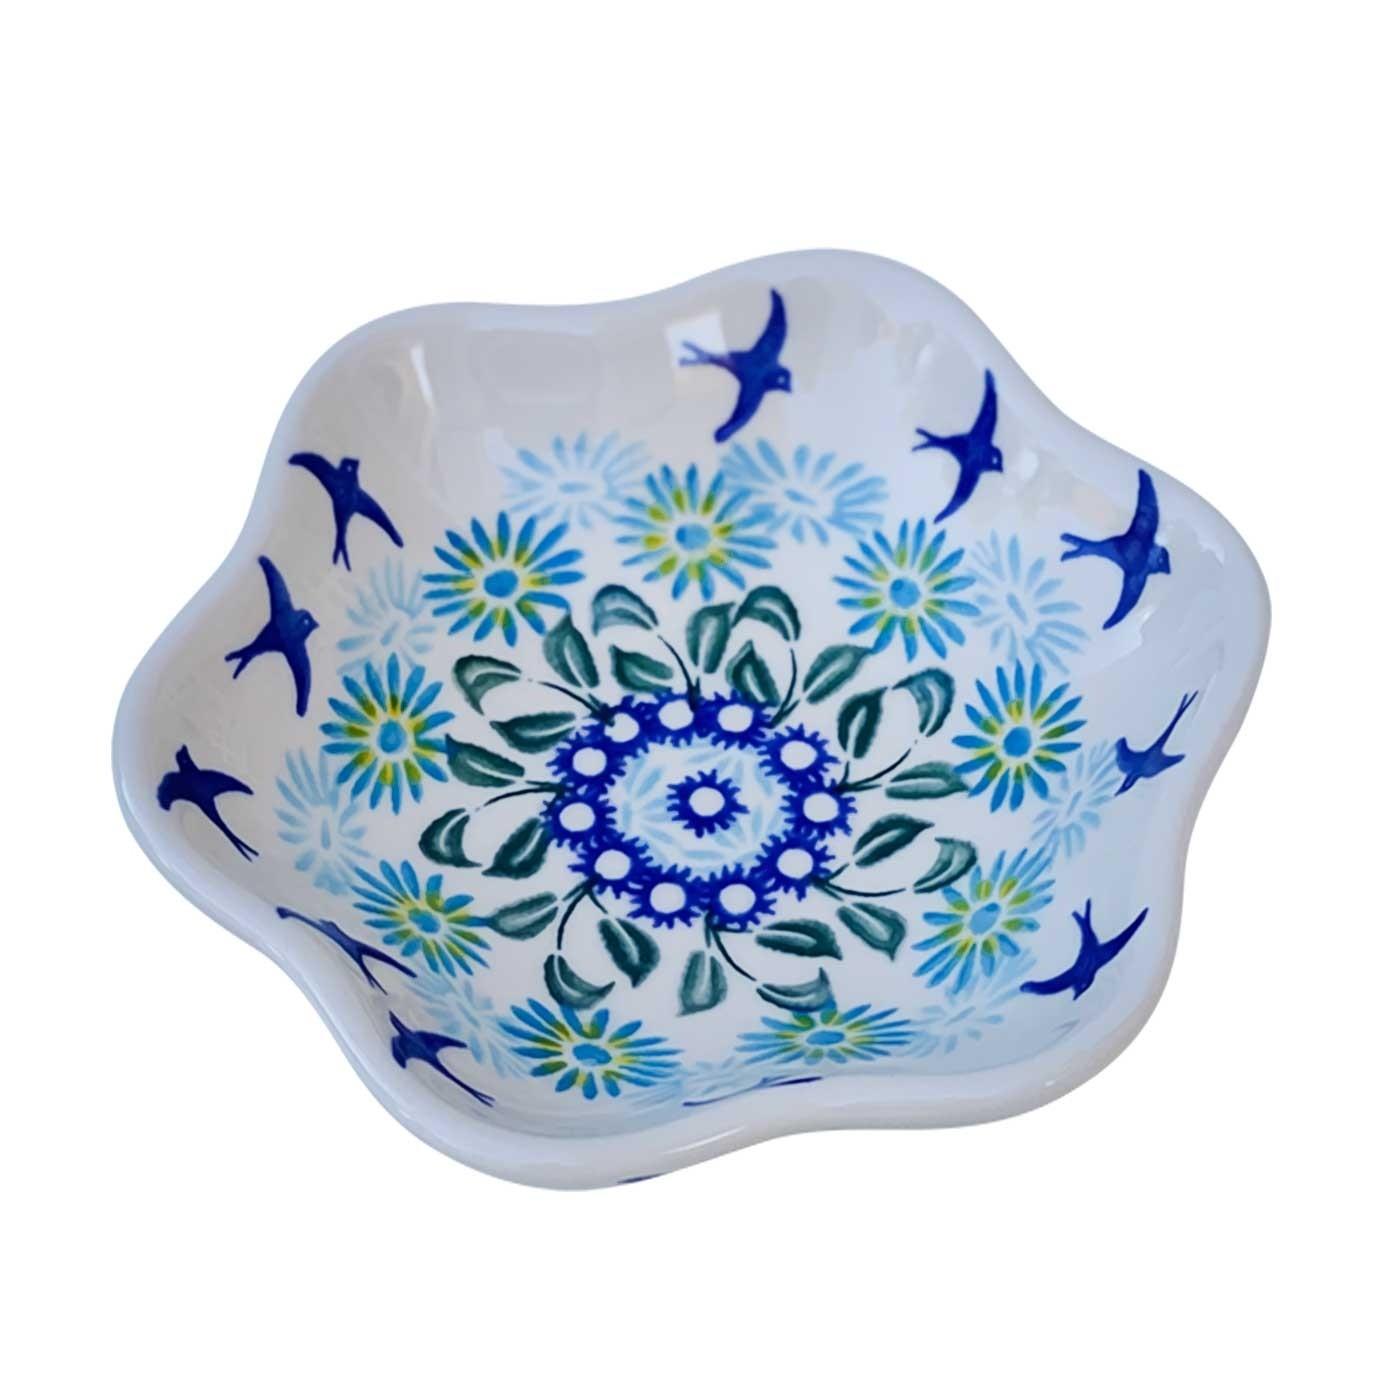 Pottery Avenue SOARING Stoneware 10-oz Boho Bowl - V445-C093 SOARING